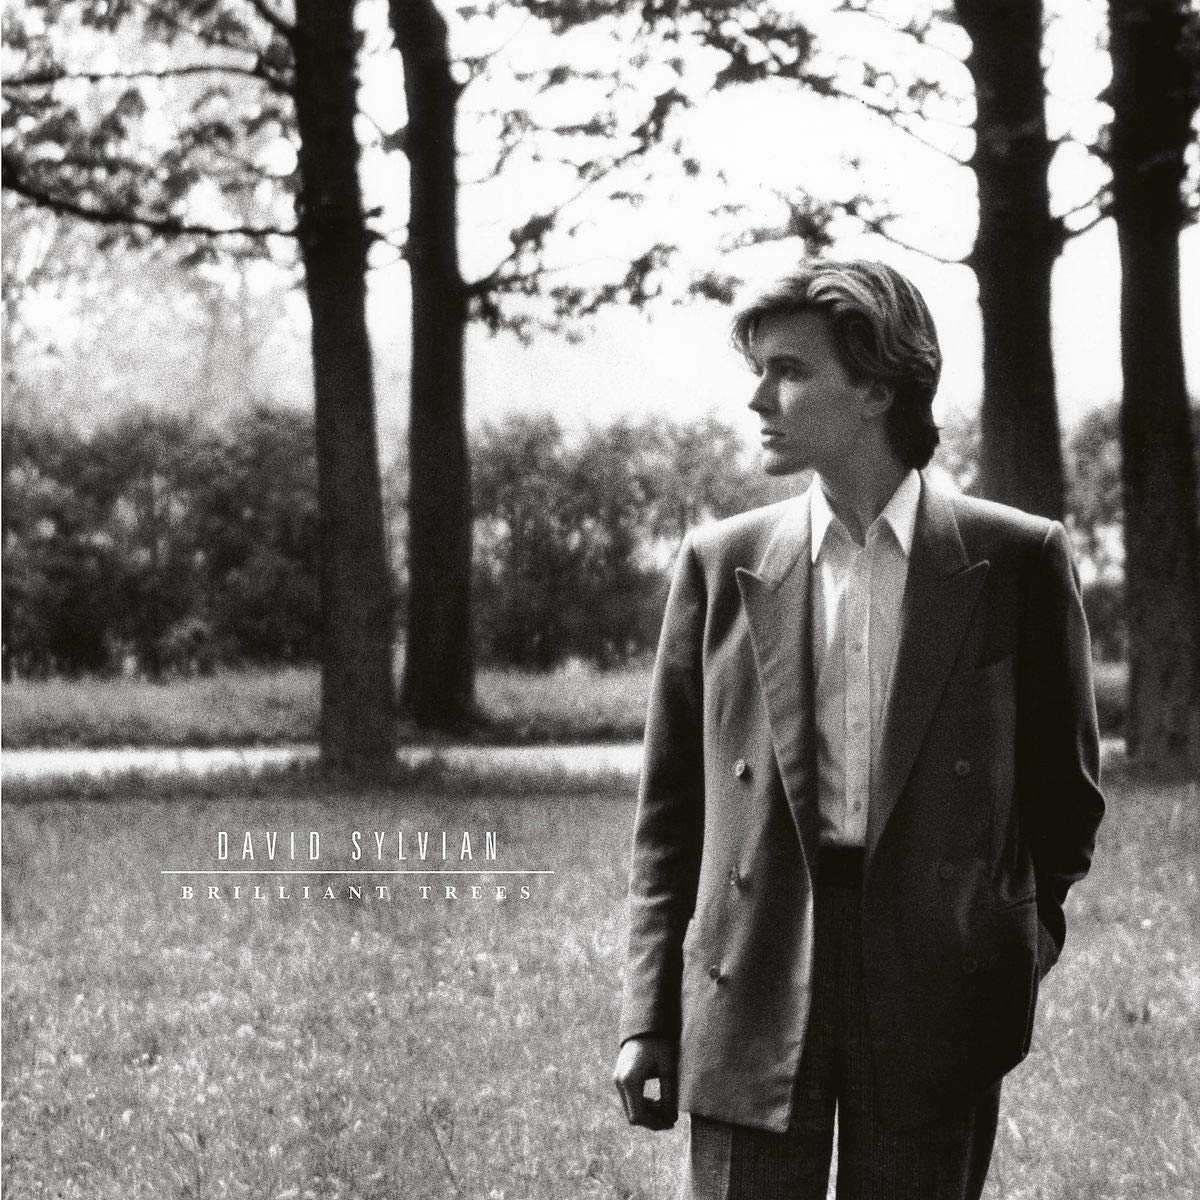 Дэвид Сильвиан David Sylvian. Brilliant Trees (LP) цена